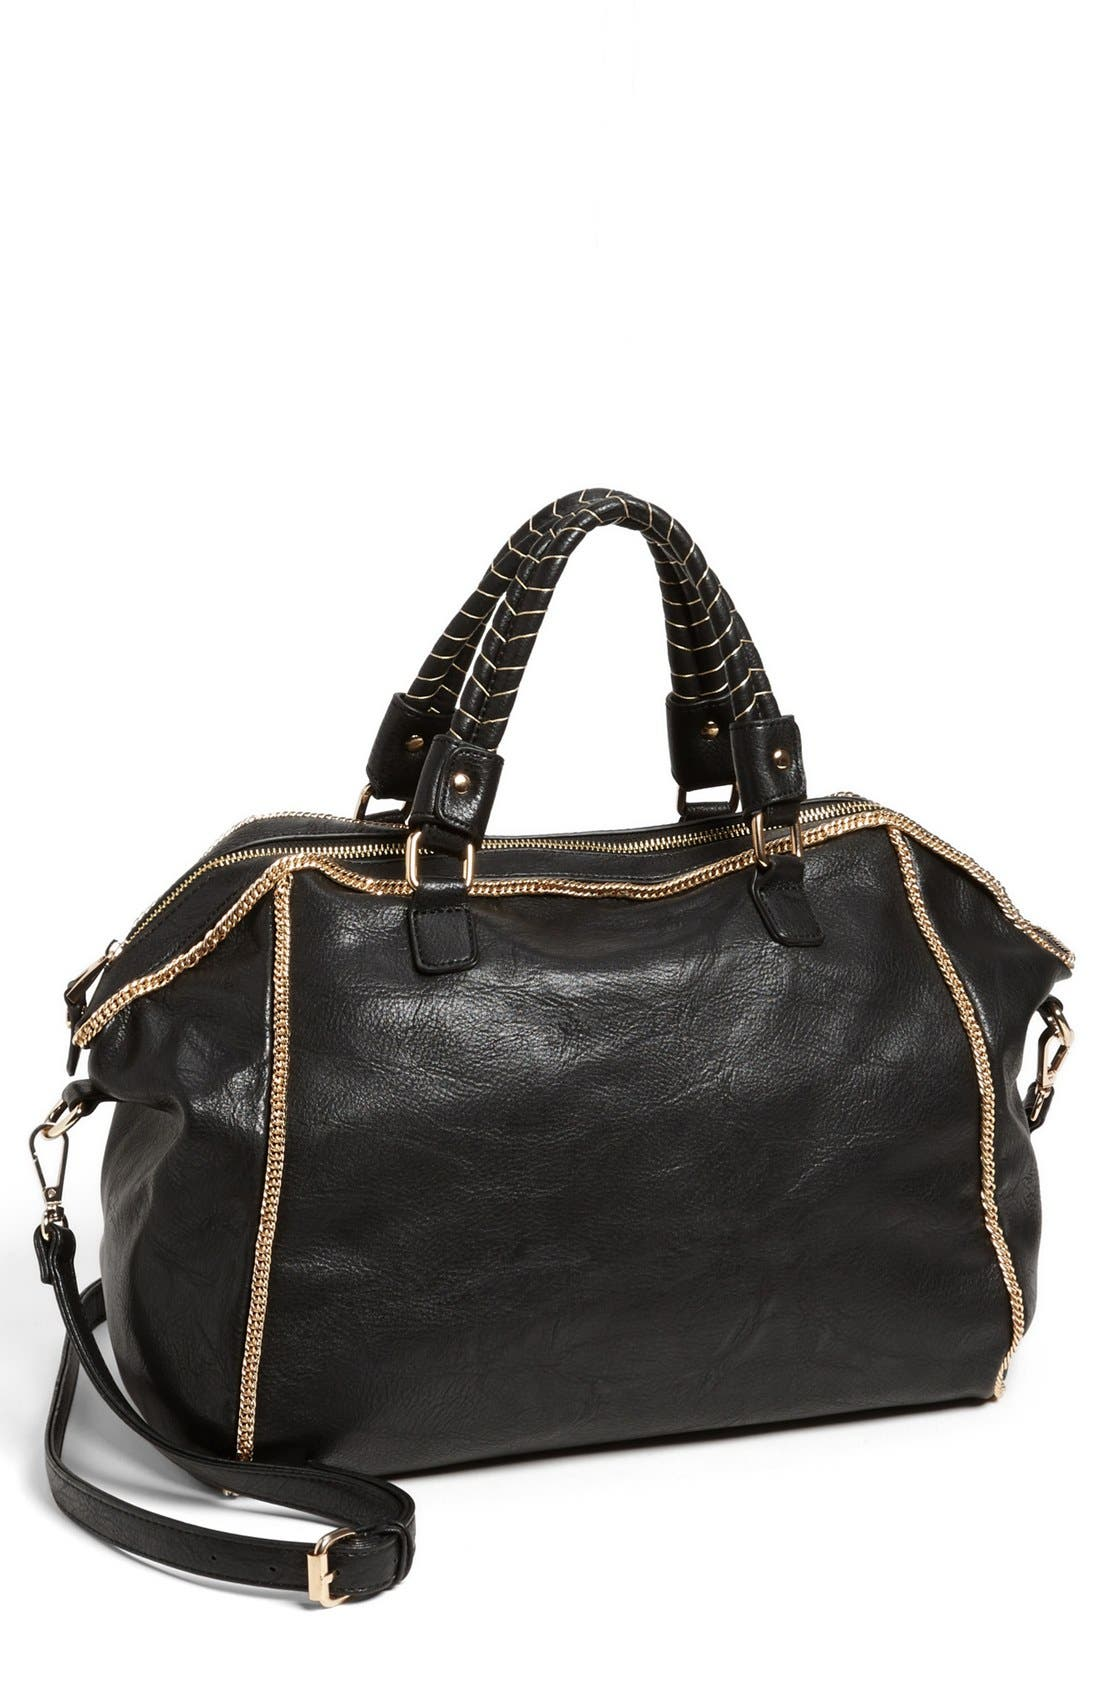 Main Image - Urban Expressions Handbags 'Janae' Faux Leather Satchel